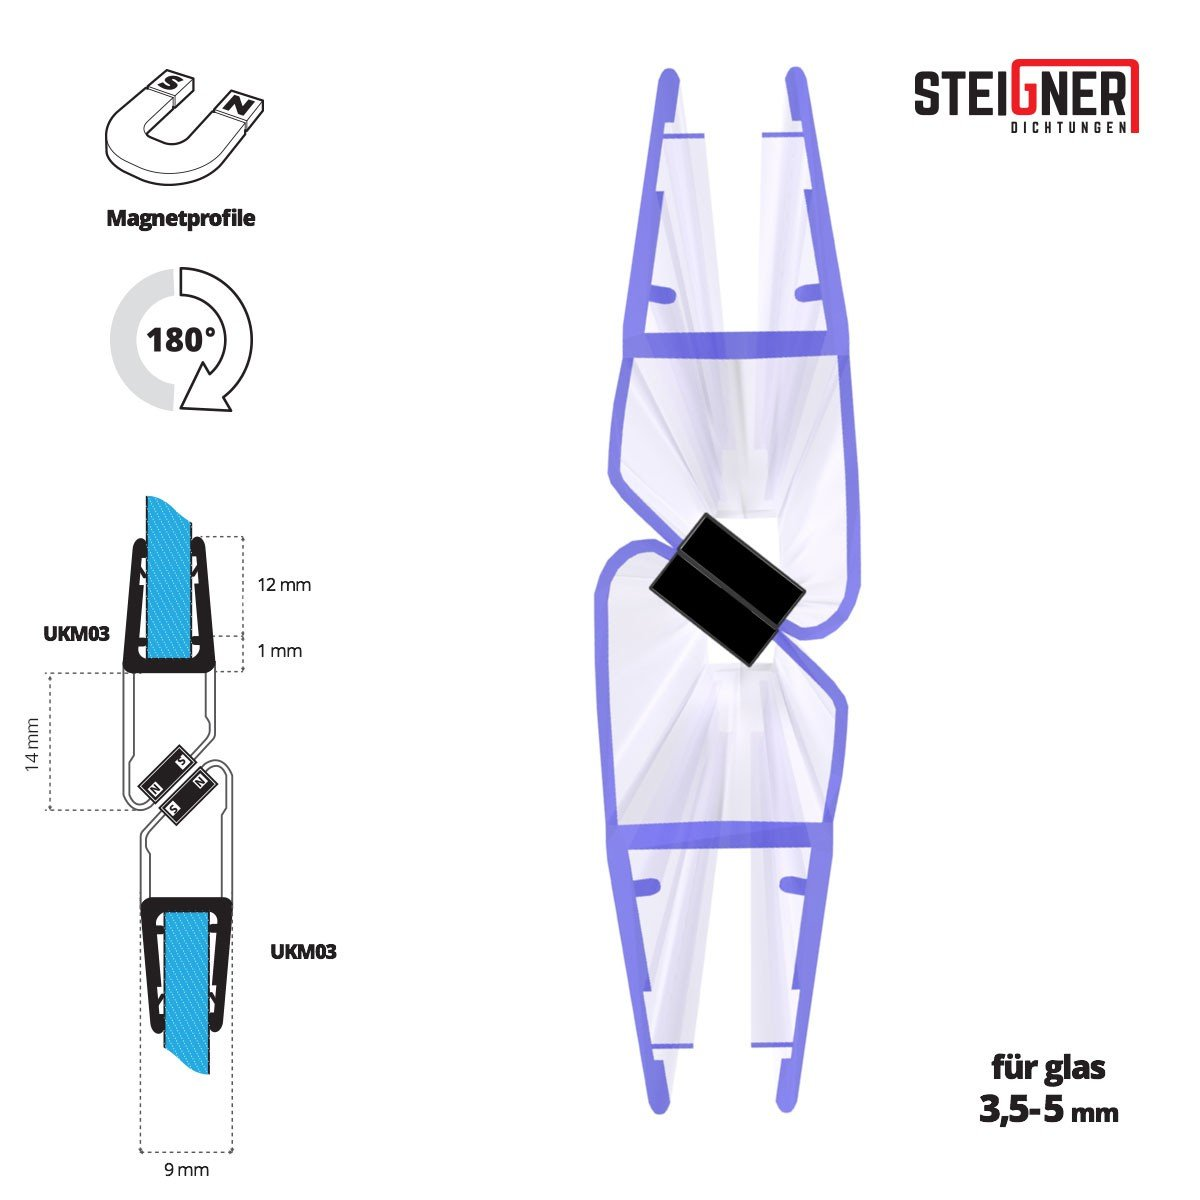 STEIGNER Set di Guarnizioni Magnetiche per Box Doccia UKM03, 3,5/4/5 mm, 180 gradi, 2 pezzi, 183 cm